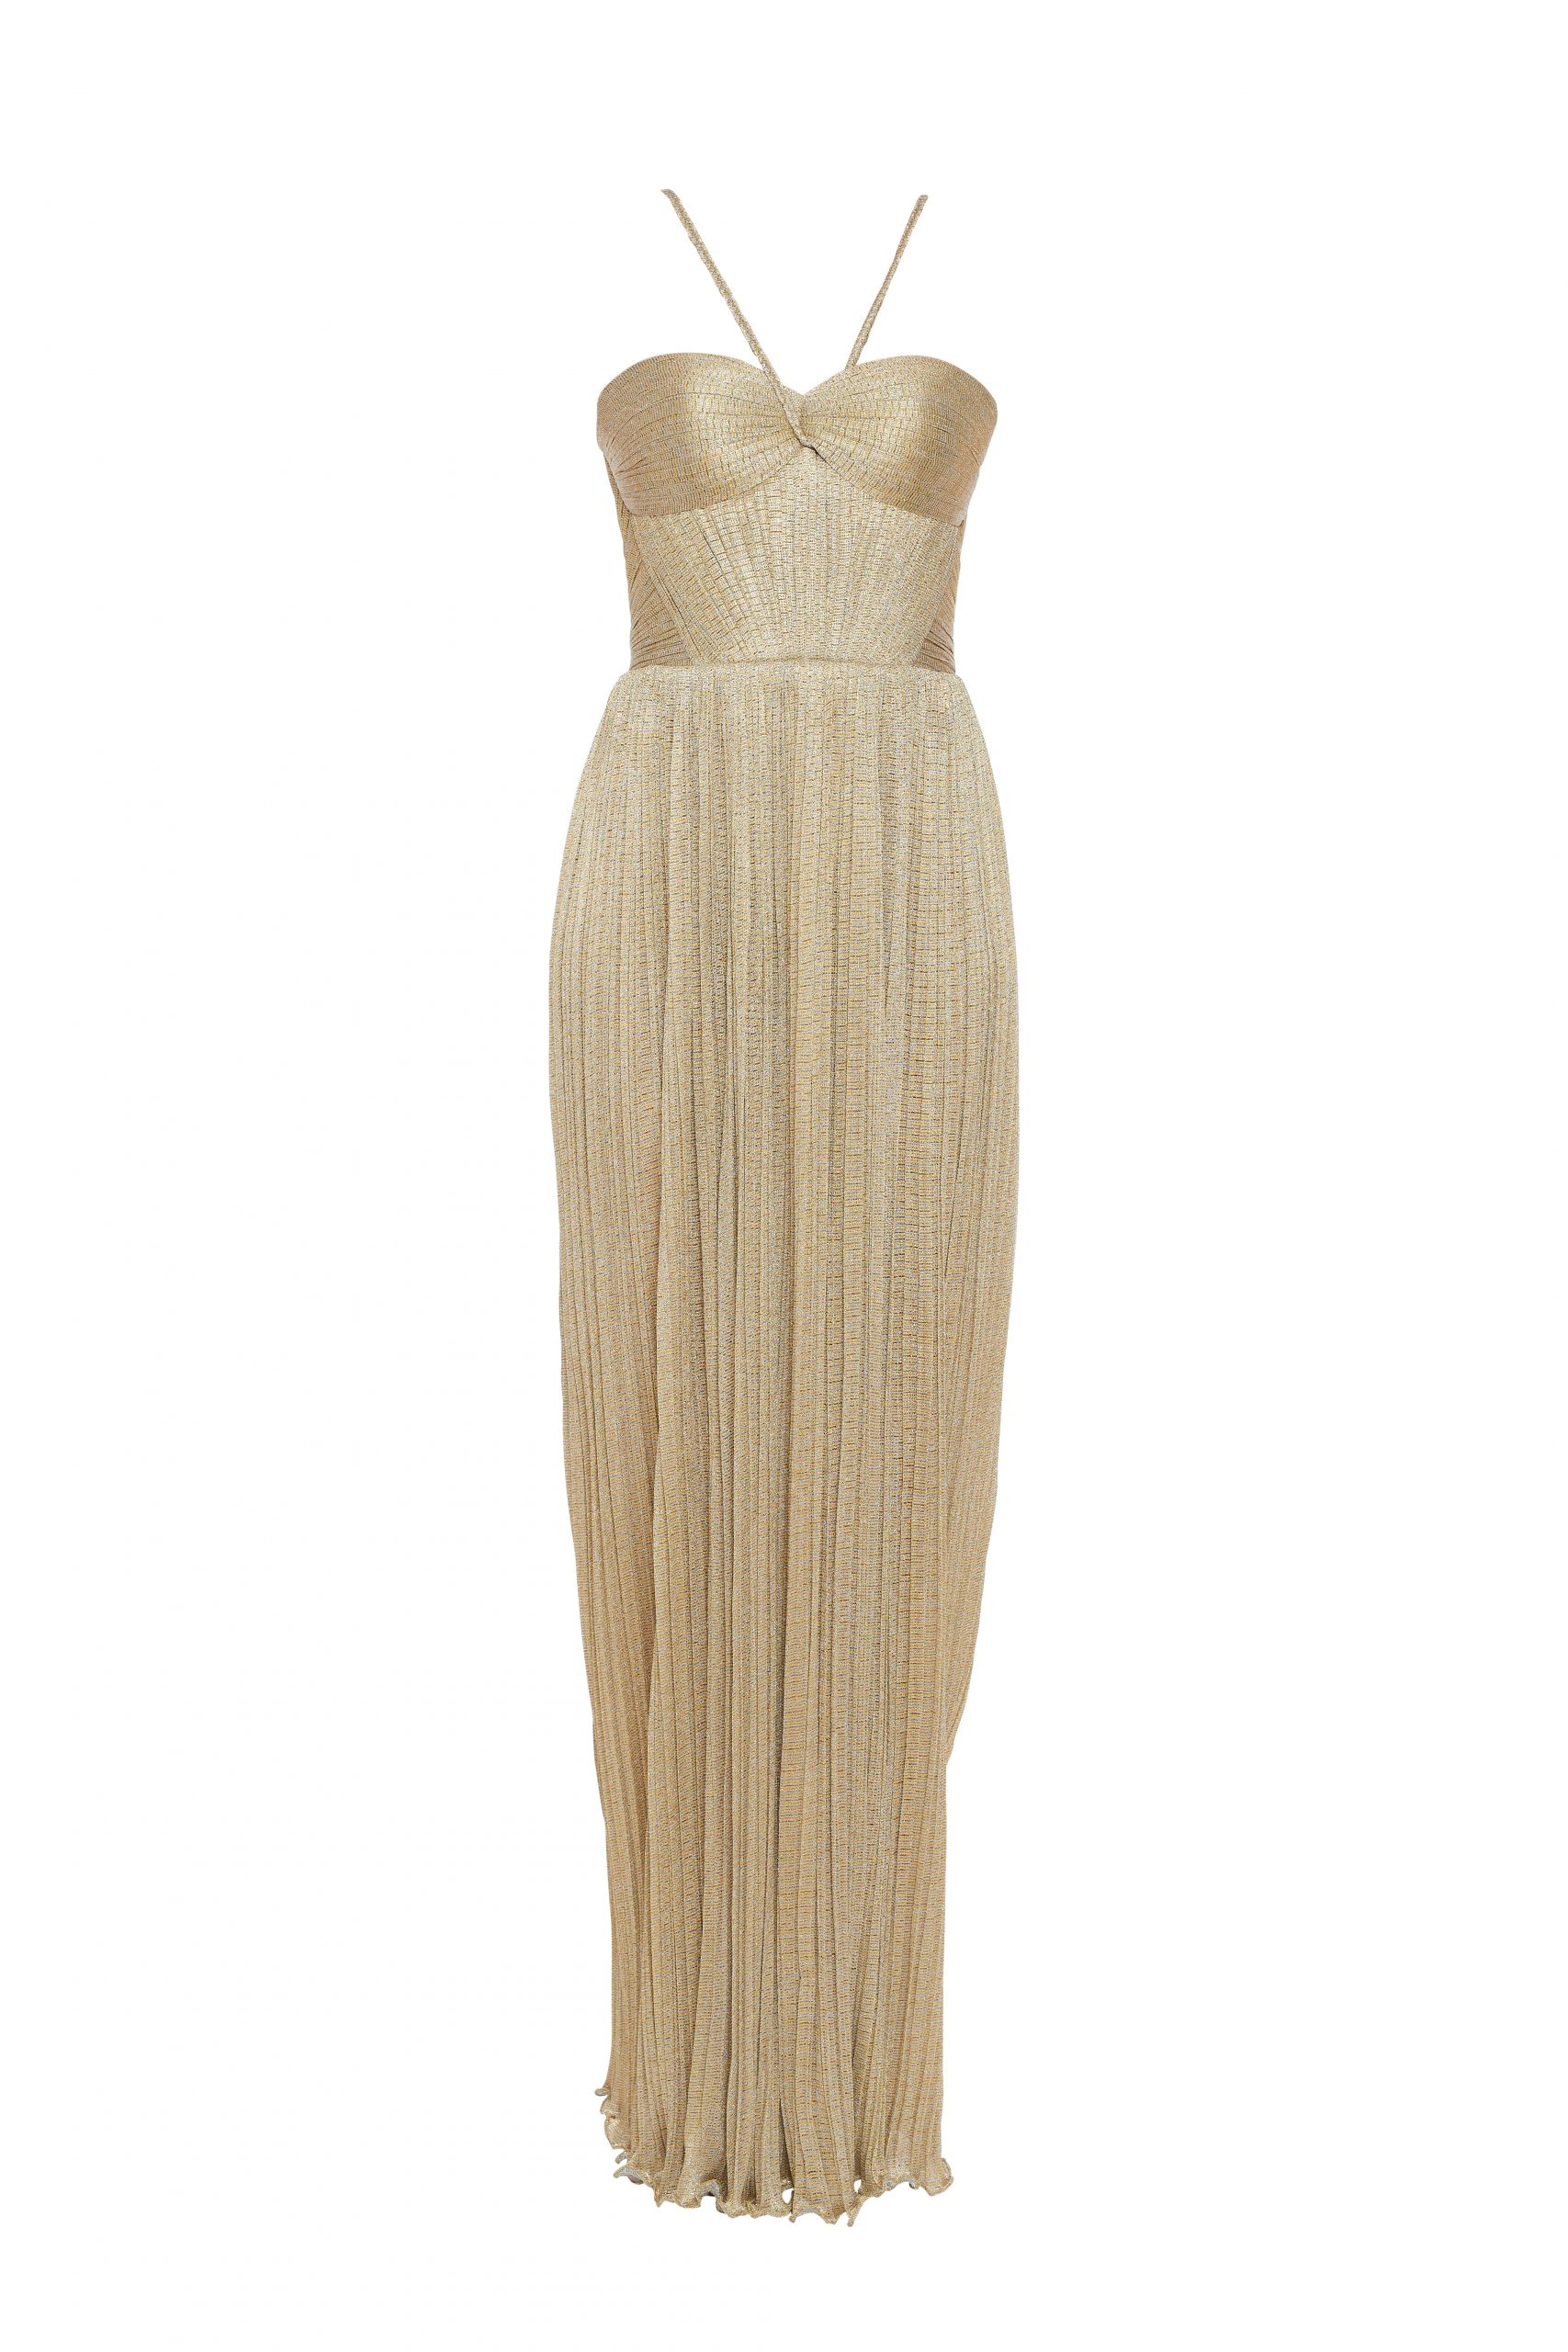 Golden draped evening gown